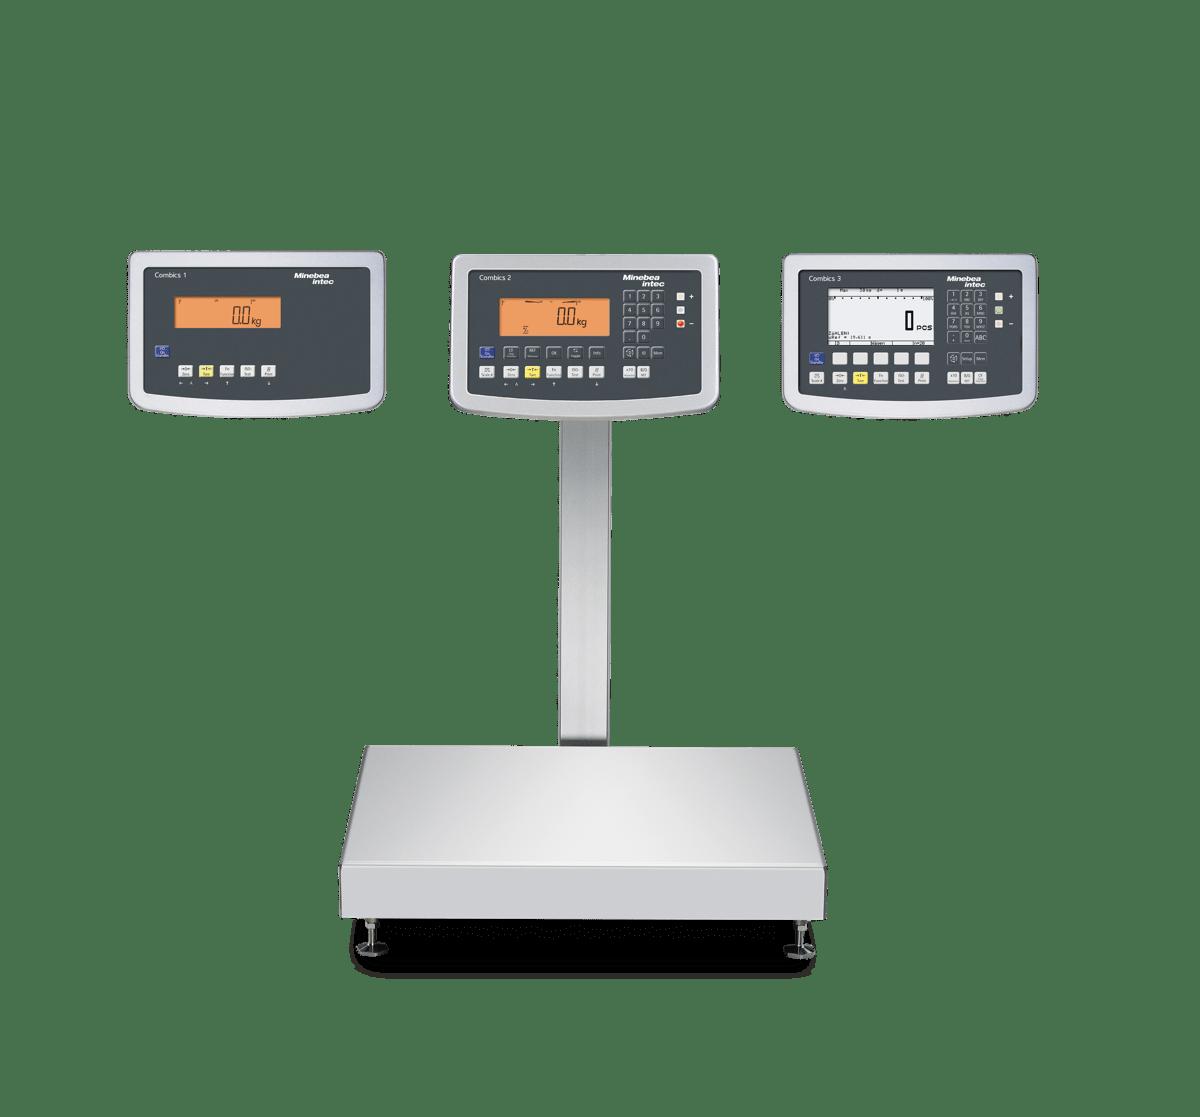 Combics Complete Scales